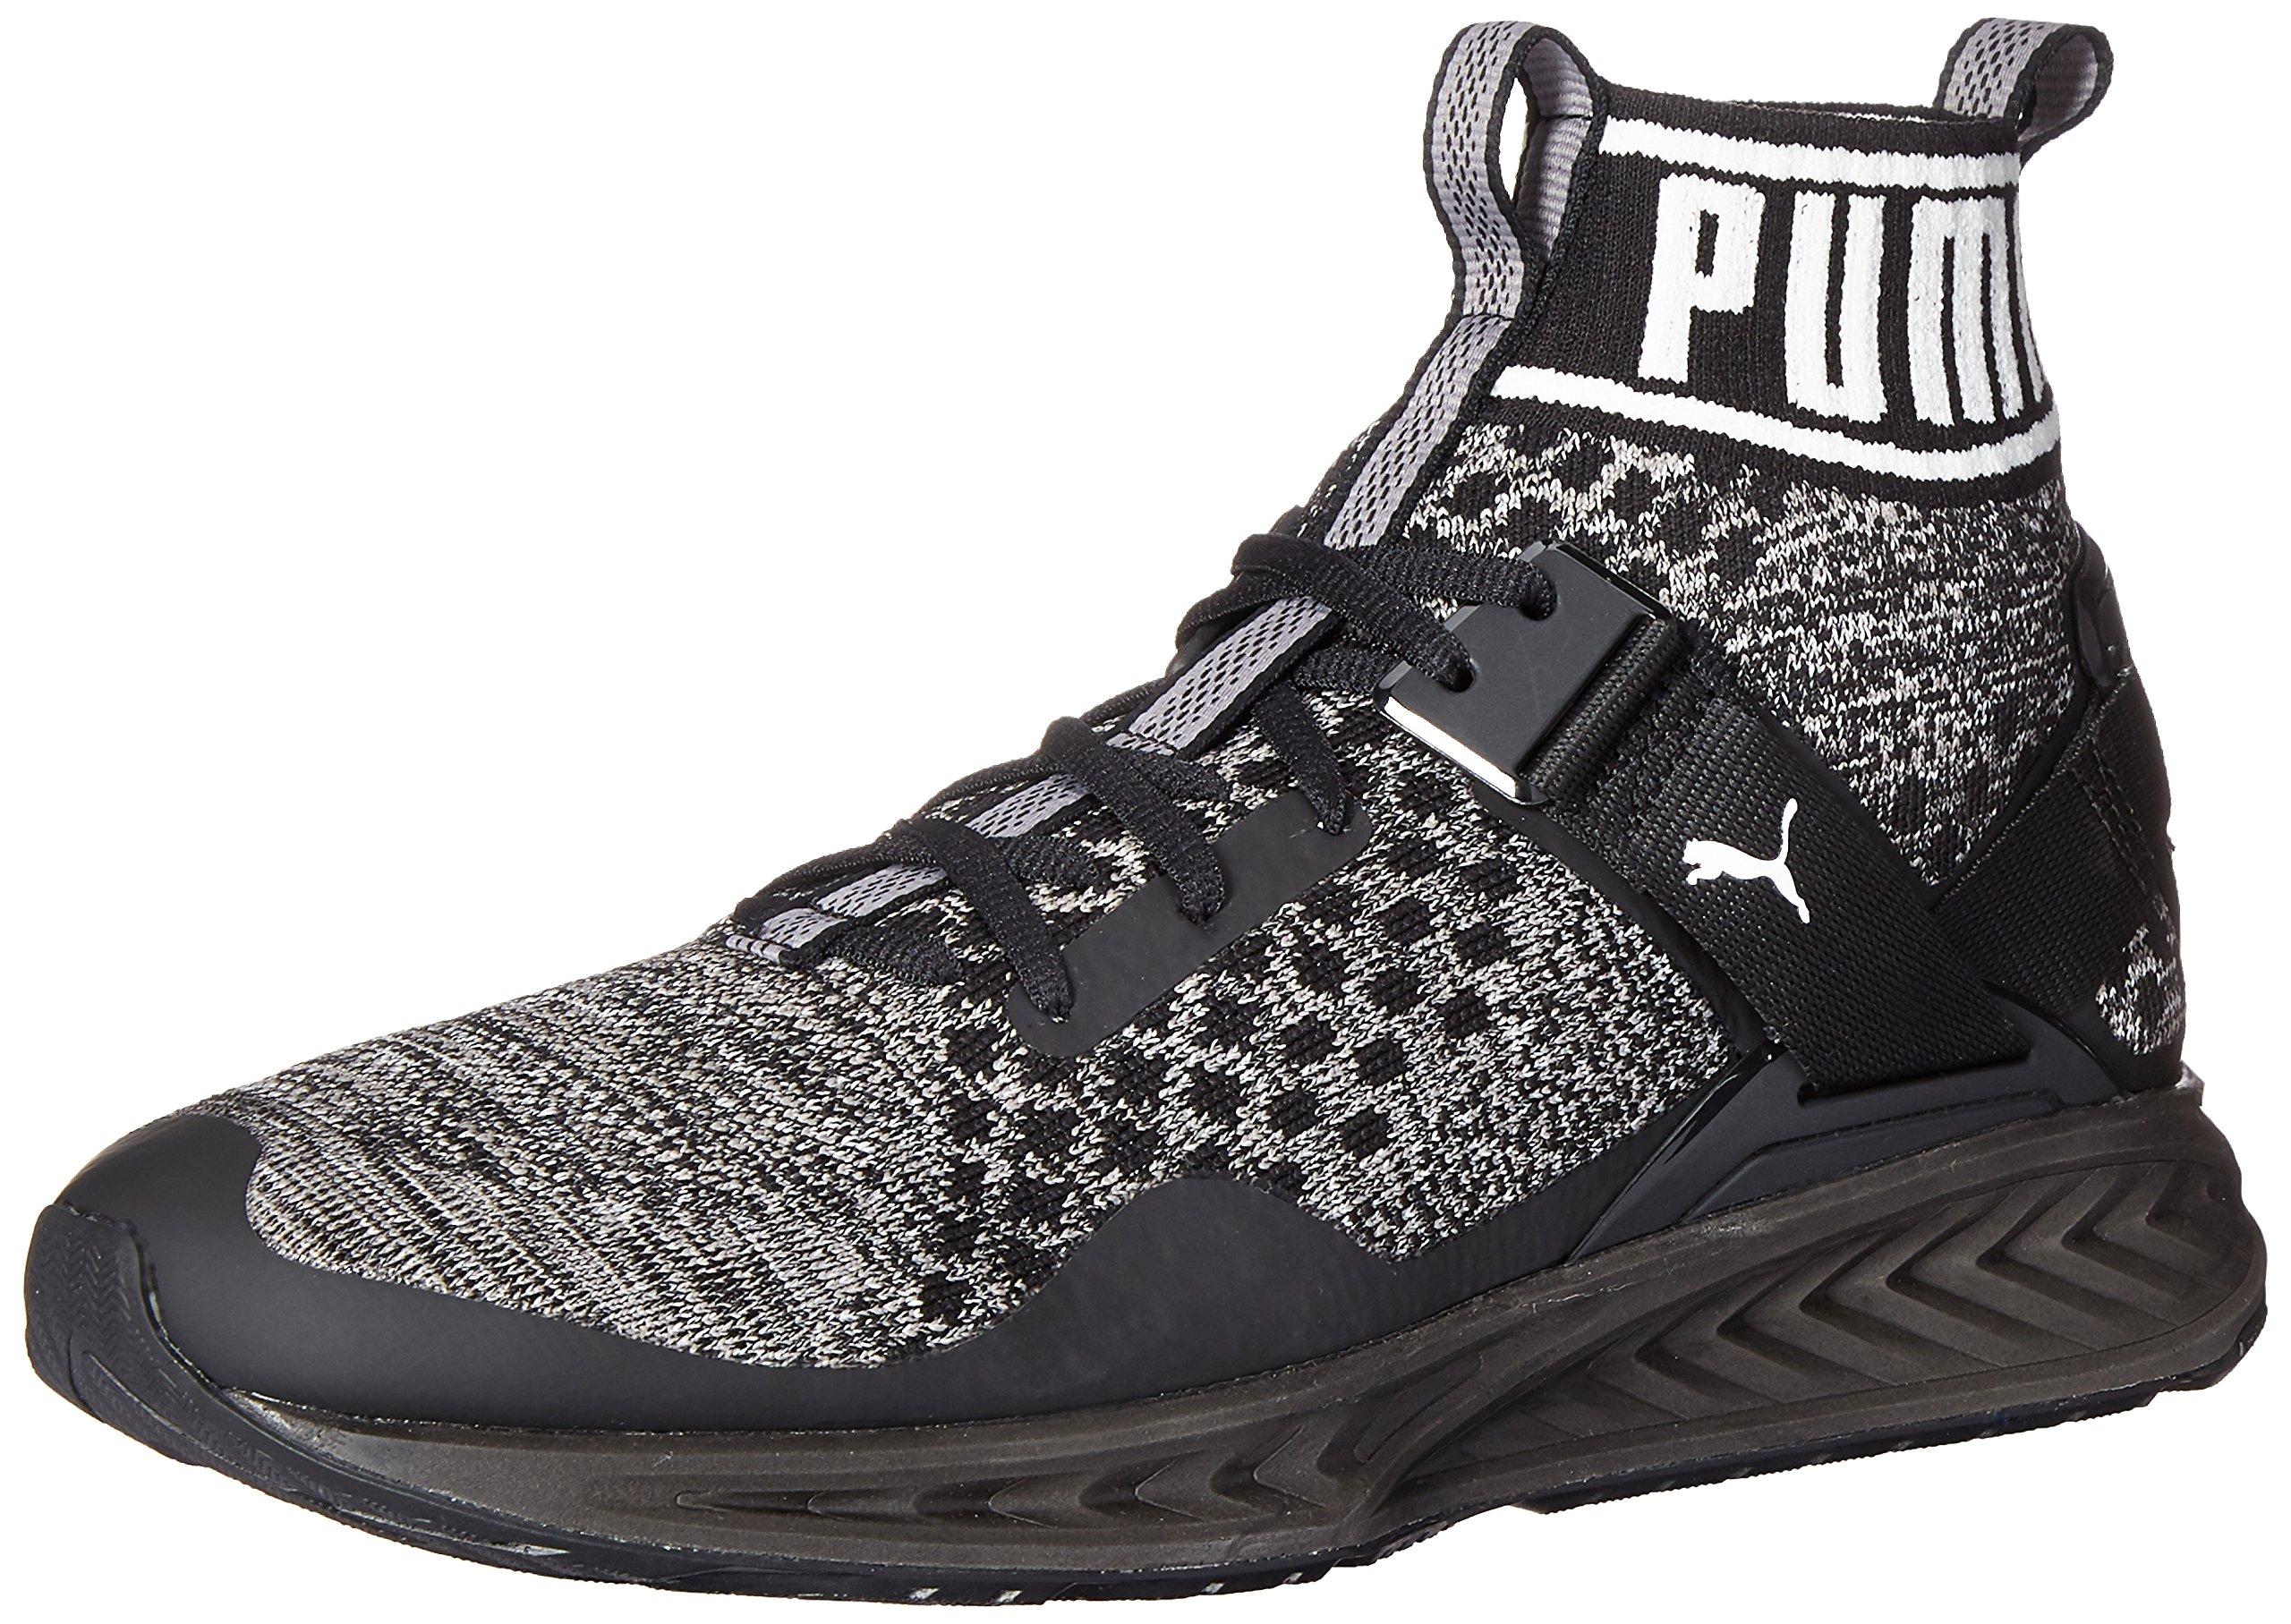 PUMA Men's Ignite Evoknit Cross-Trainer Shoe, Black/Quiet Shade Black, 10.5 M US